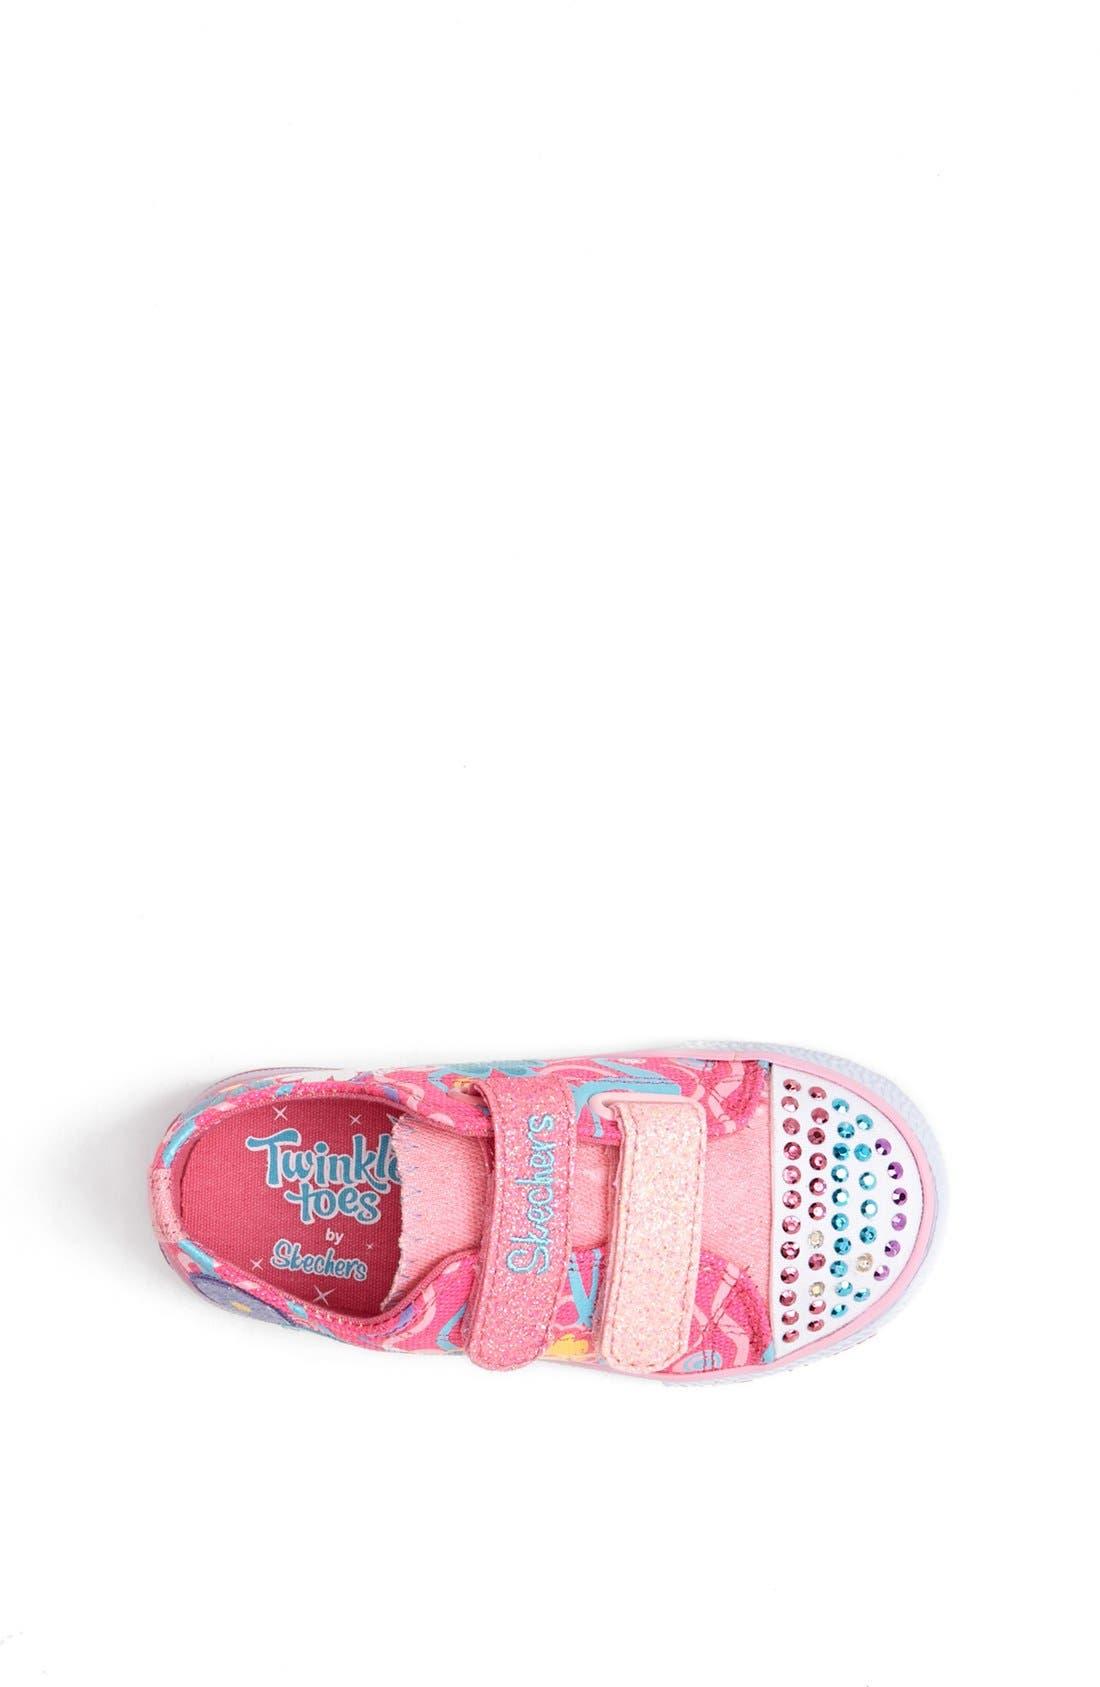 Alternate Image 3  - SKECHERS 'Twinkle Toes - Sweet Talk' Light-Up Sneaker (Walker & Toddler)